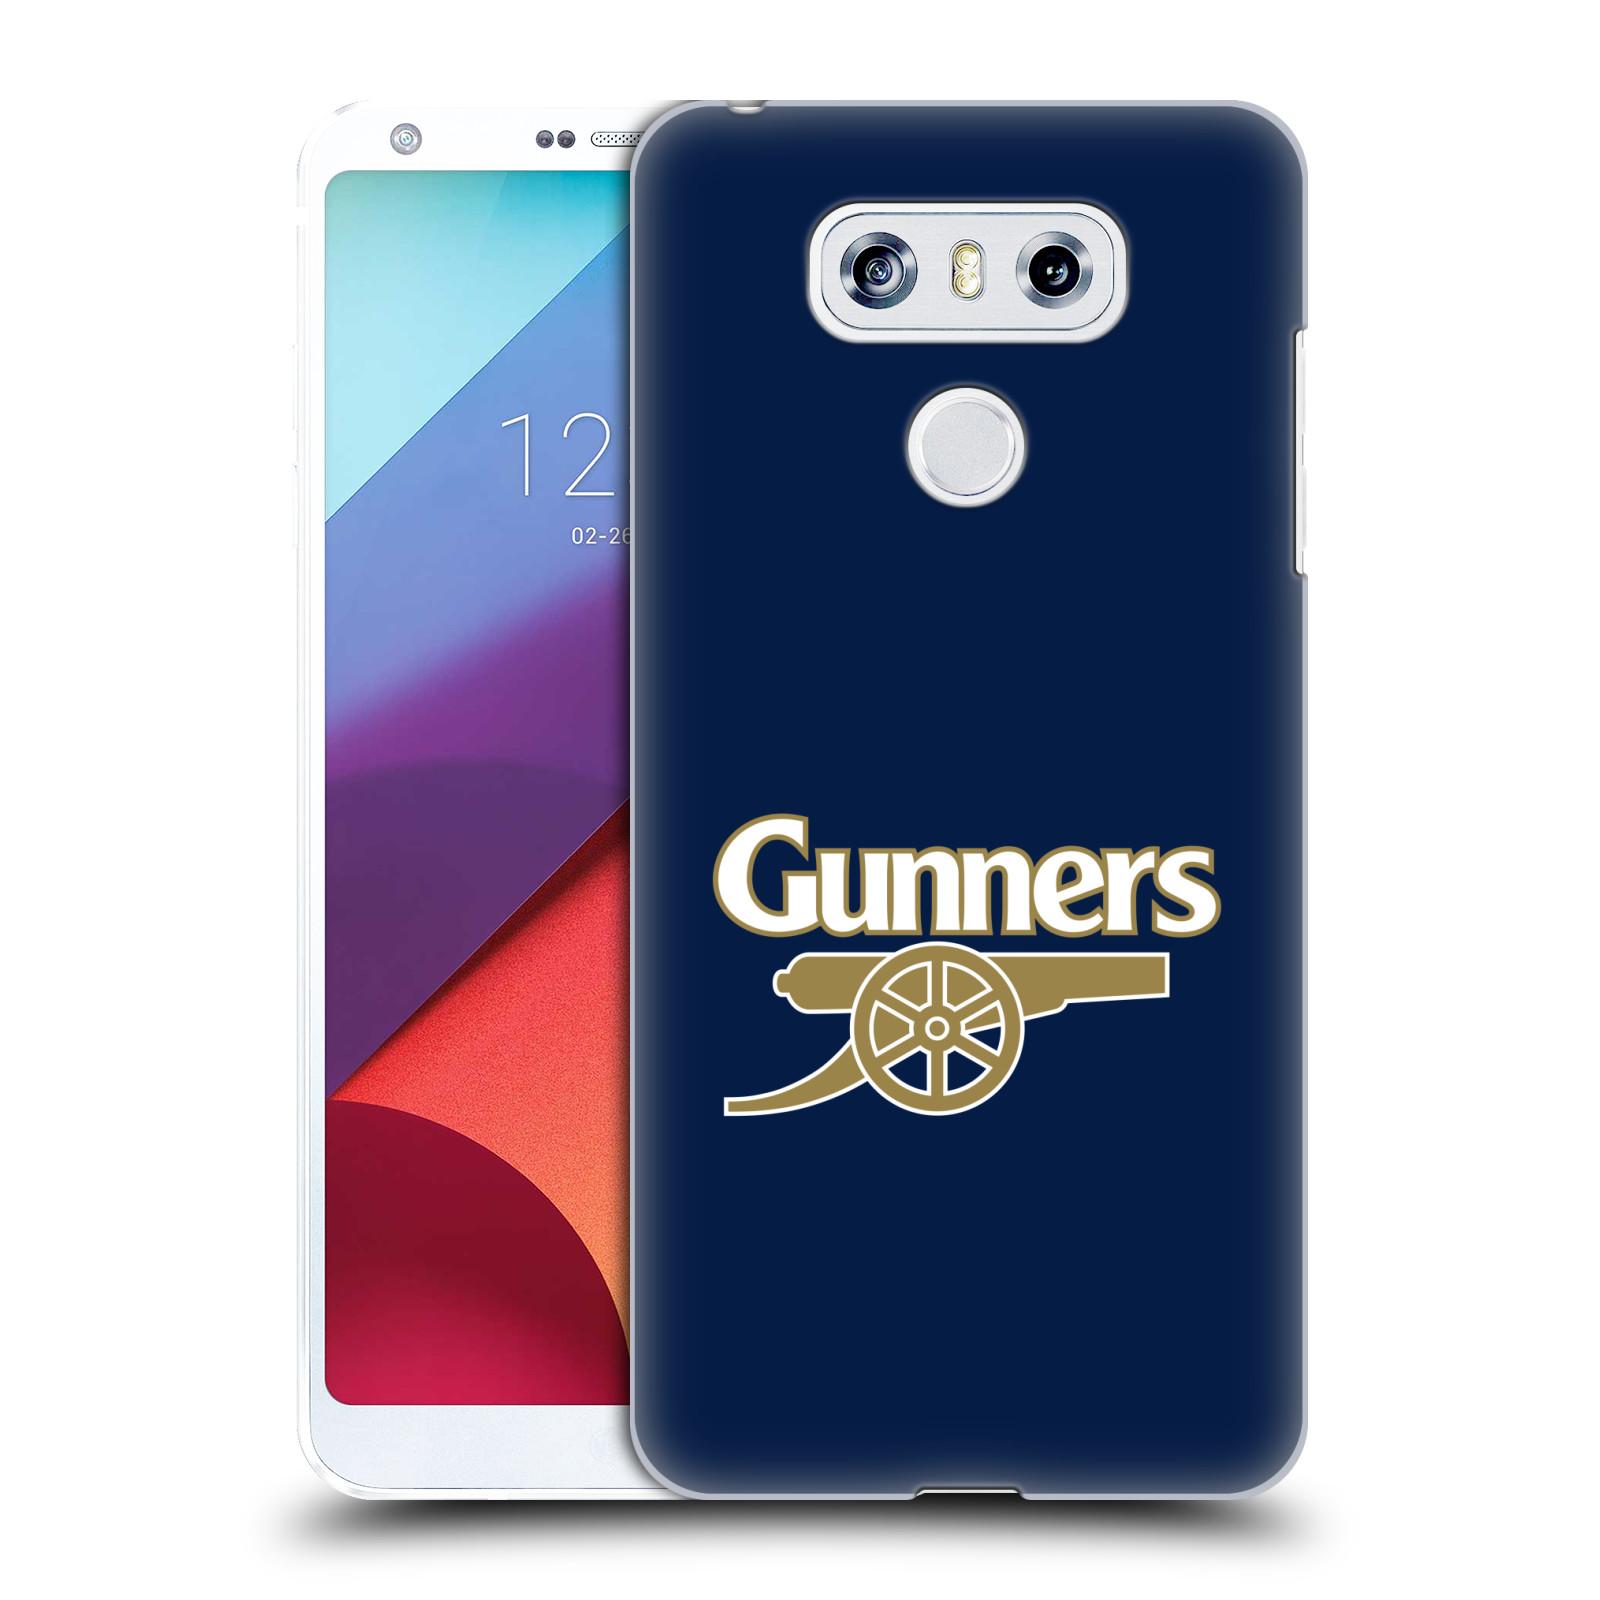 Plastové pouzdro na mobil LG G6 - Head Case - Arsenal FC - Gunners